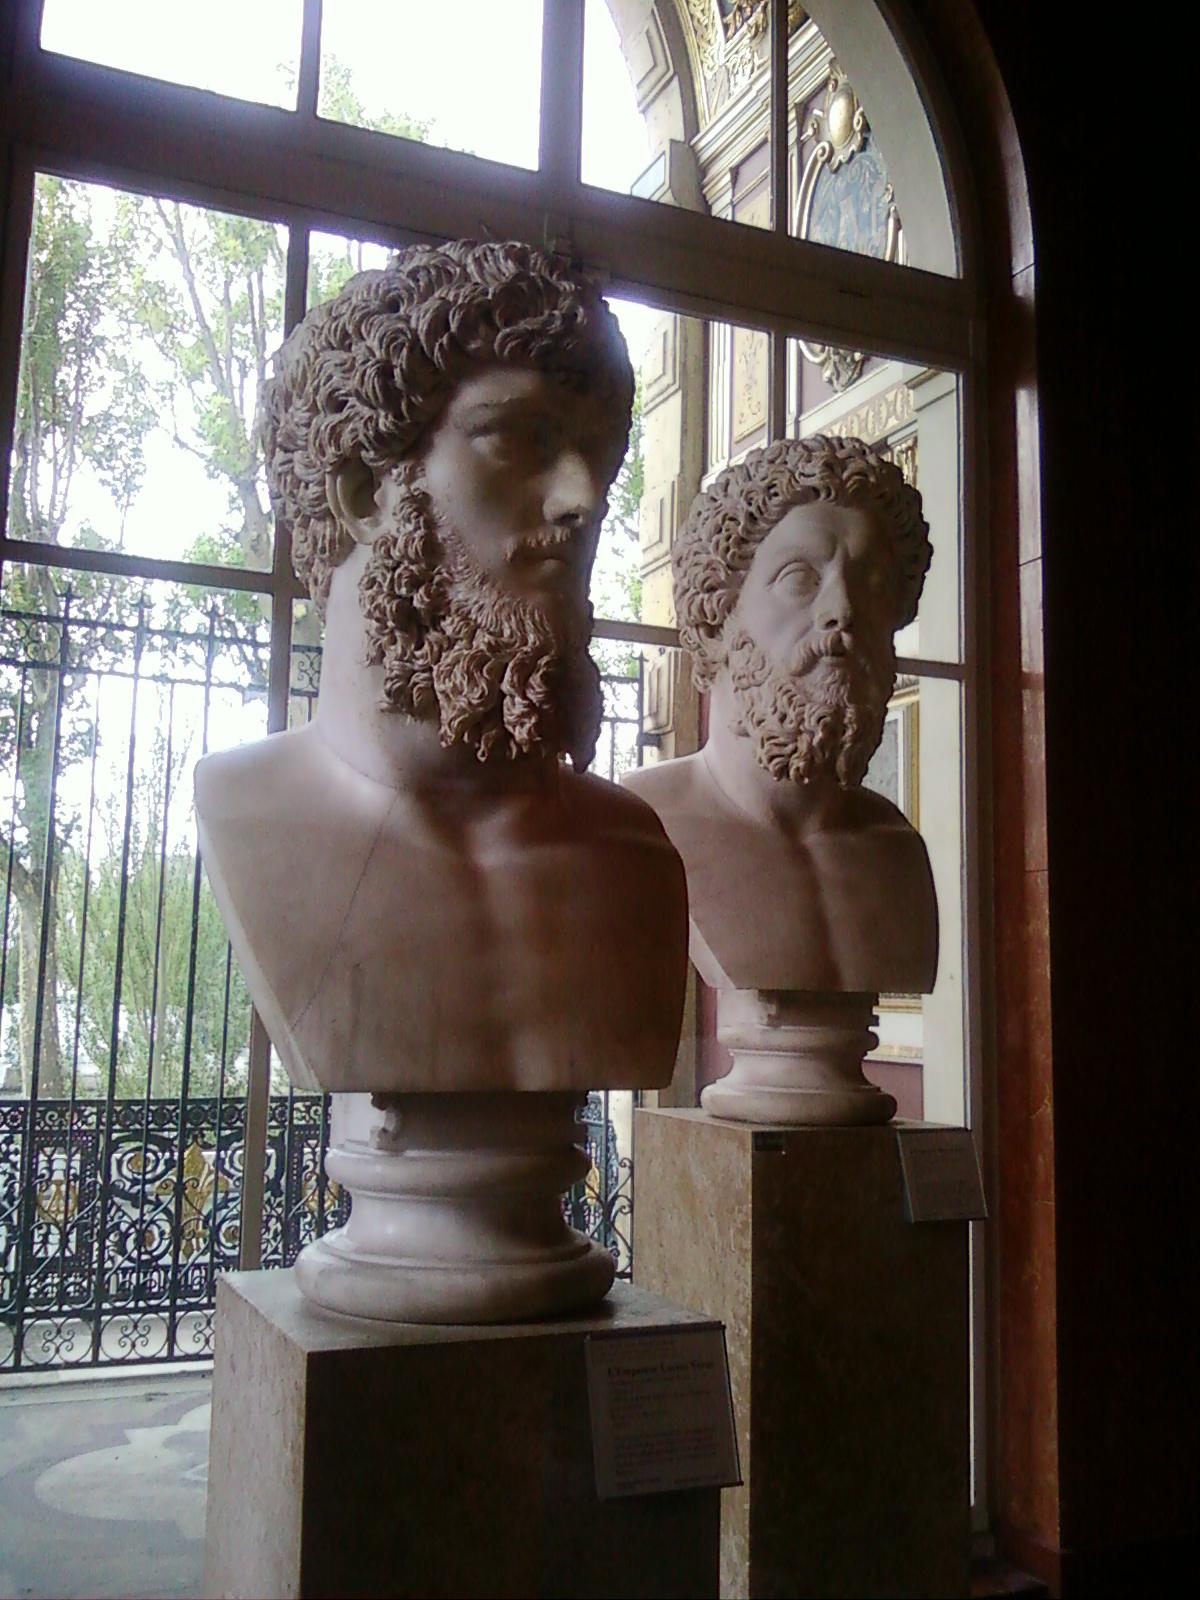 Louvre 23 by Wild-Neko